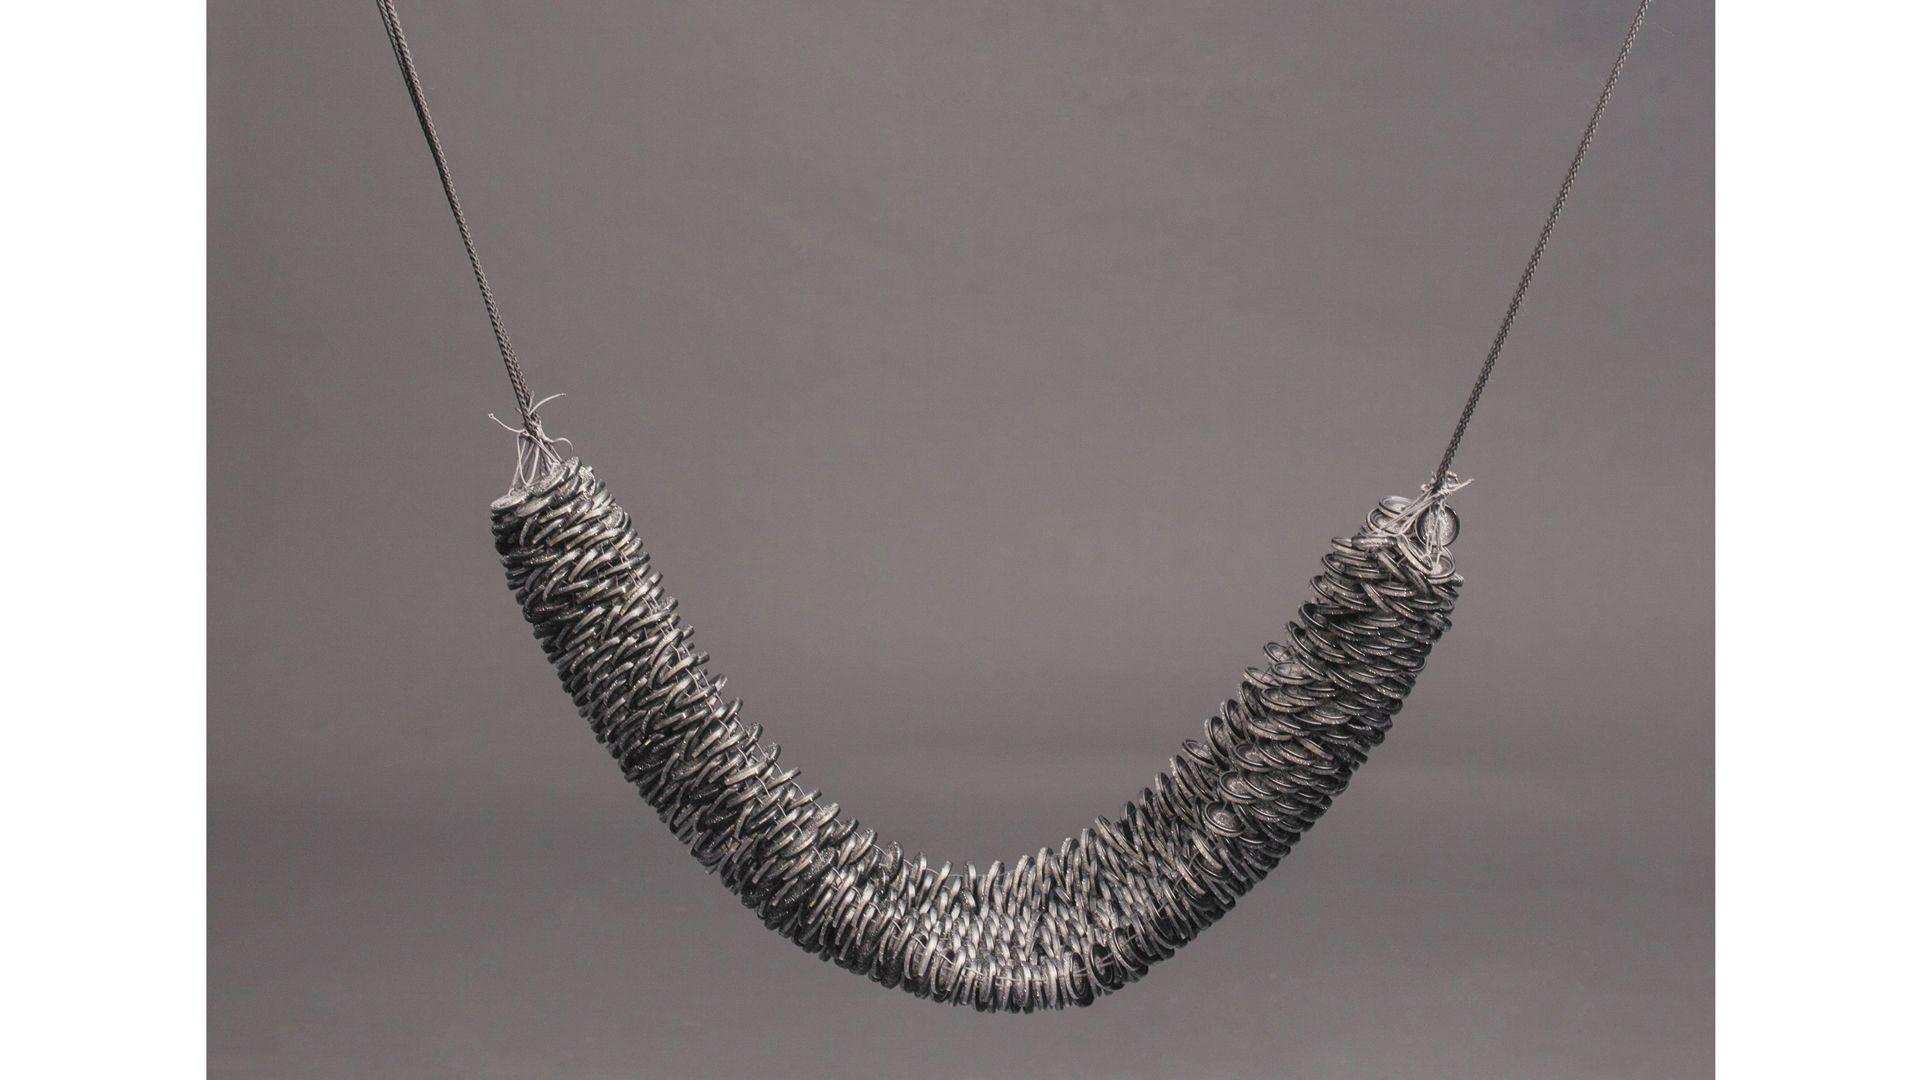 Swing of buttons by Zuzanna Bujacz and Redziewiarstwo group